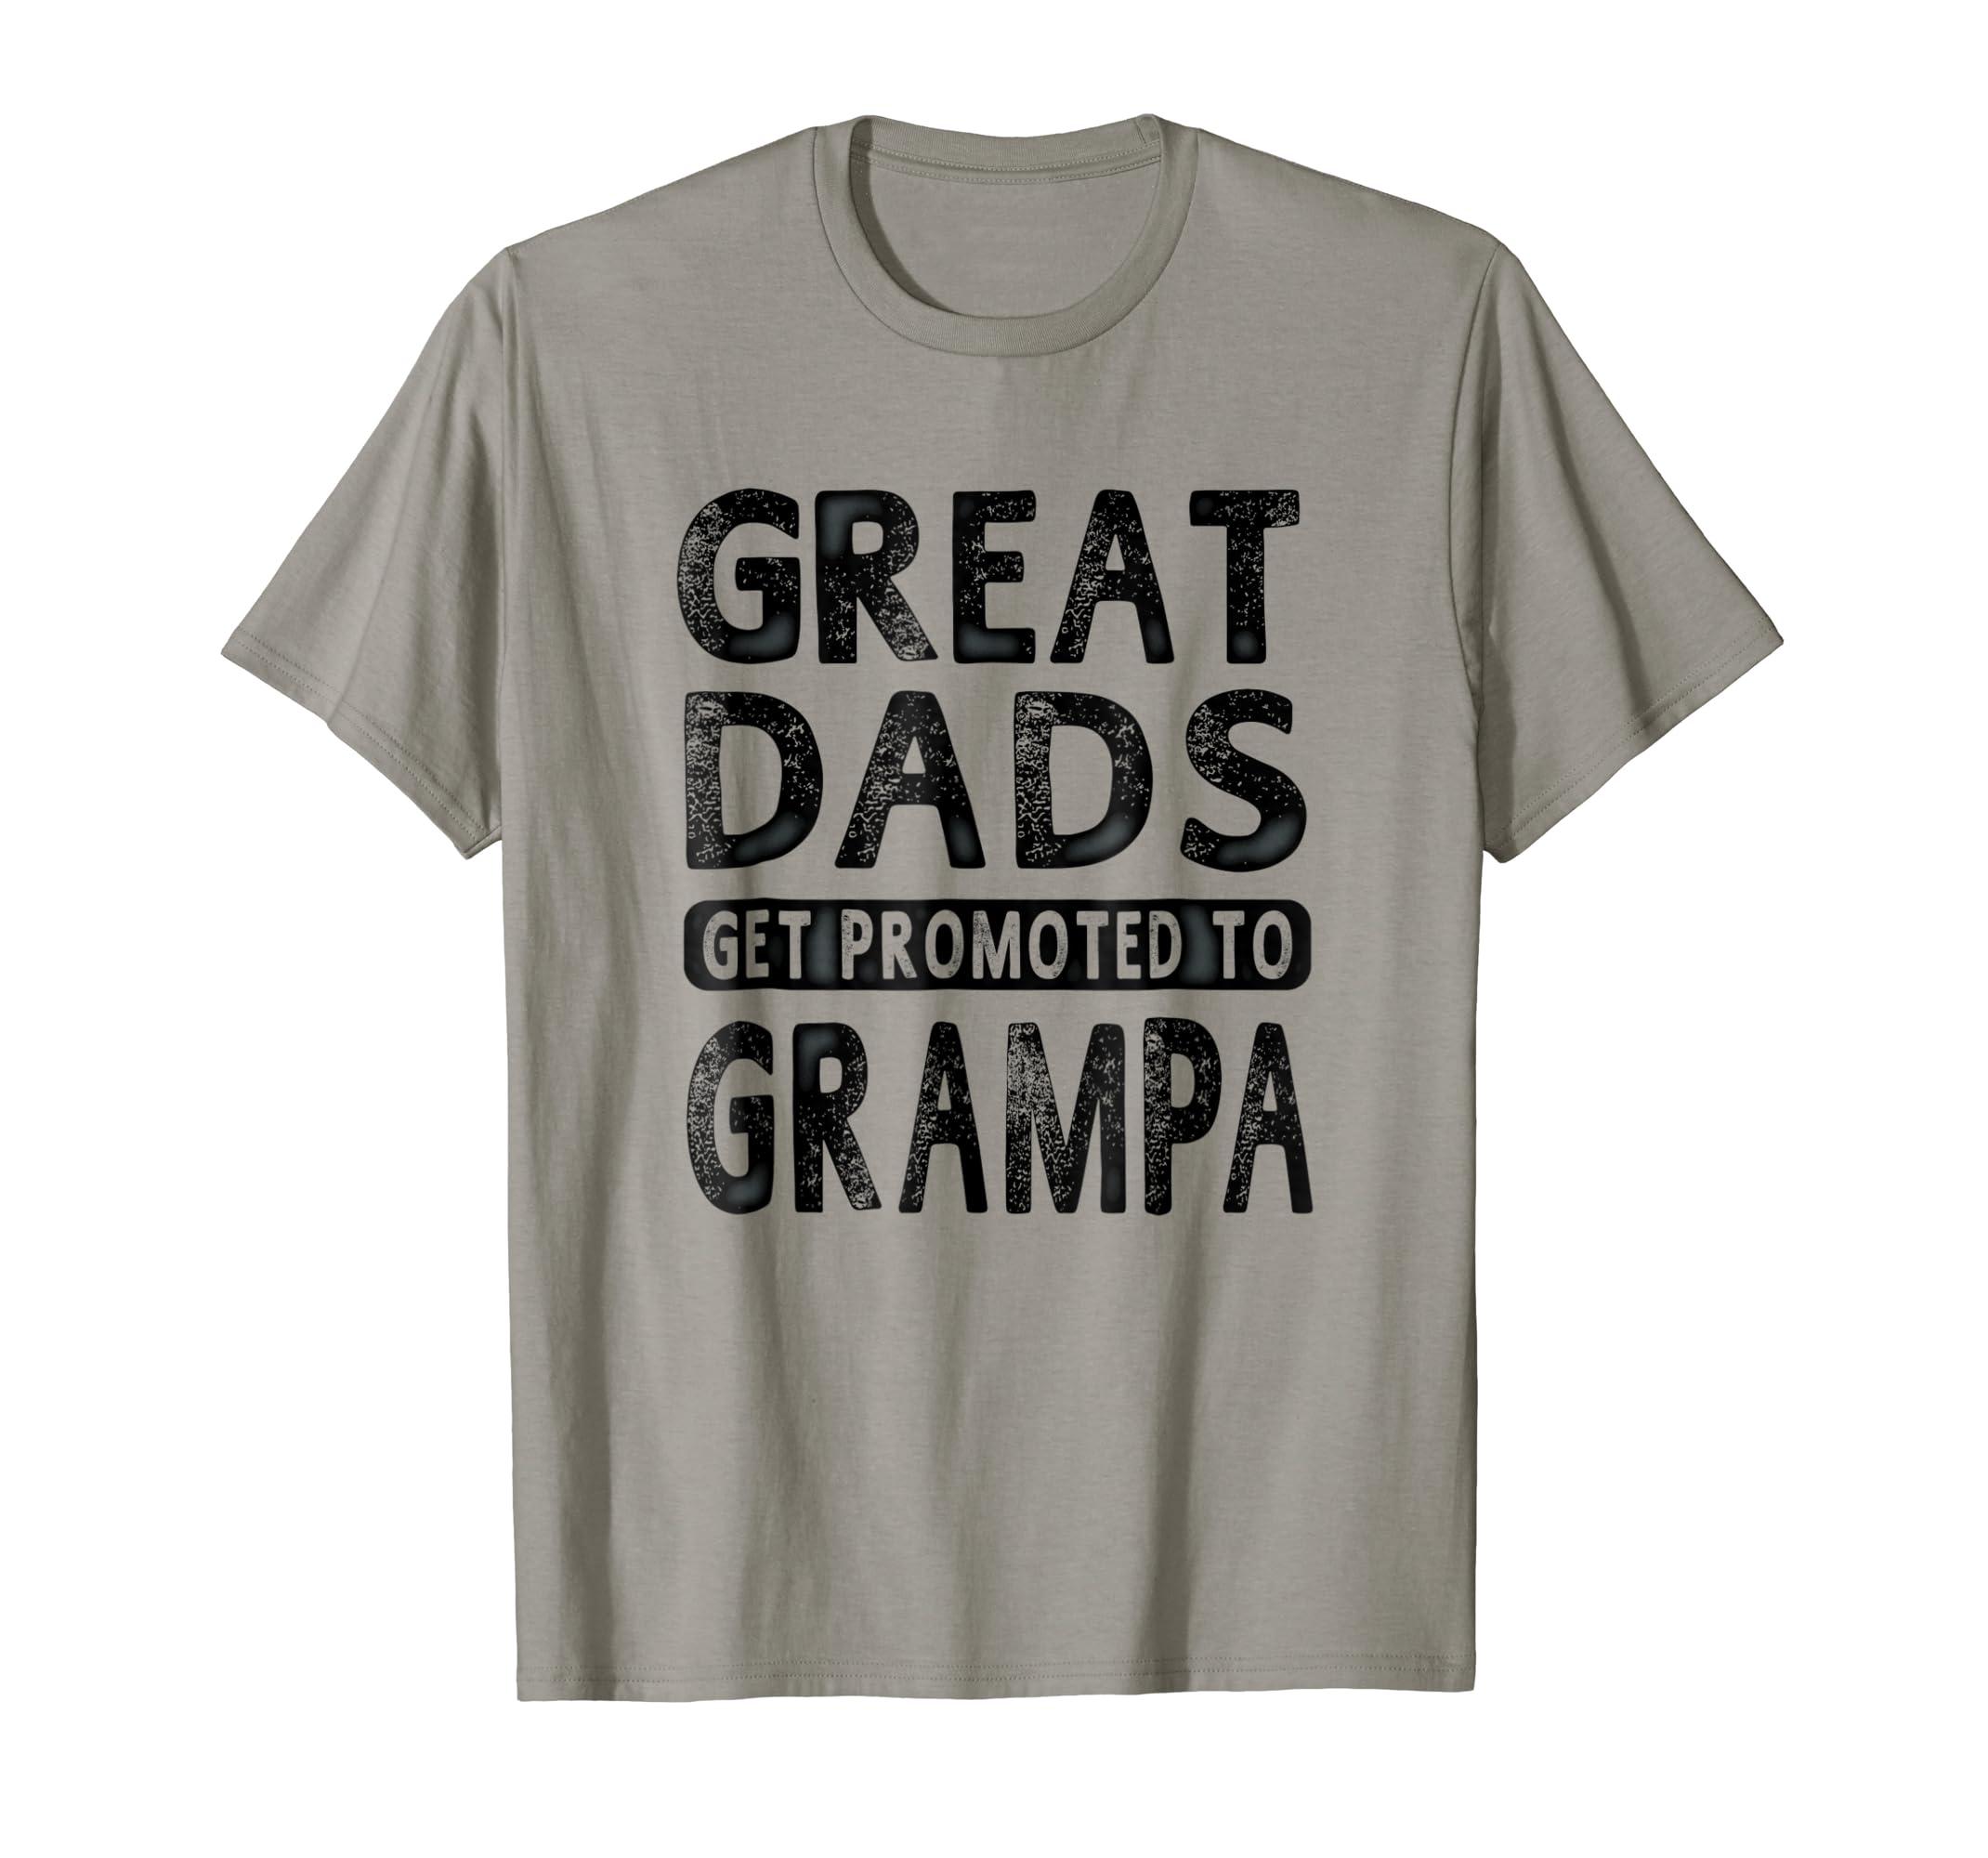 8aeca767 Amazon.com: Mens Great Dads Get Promoted To Grampa Shirt Grandpa Men T-shirt:  Clothing